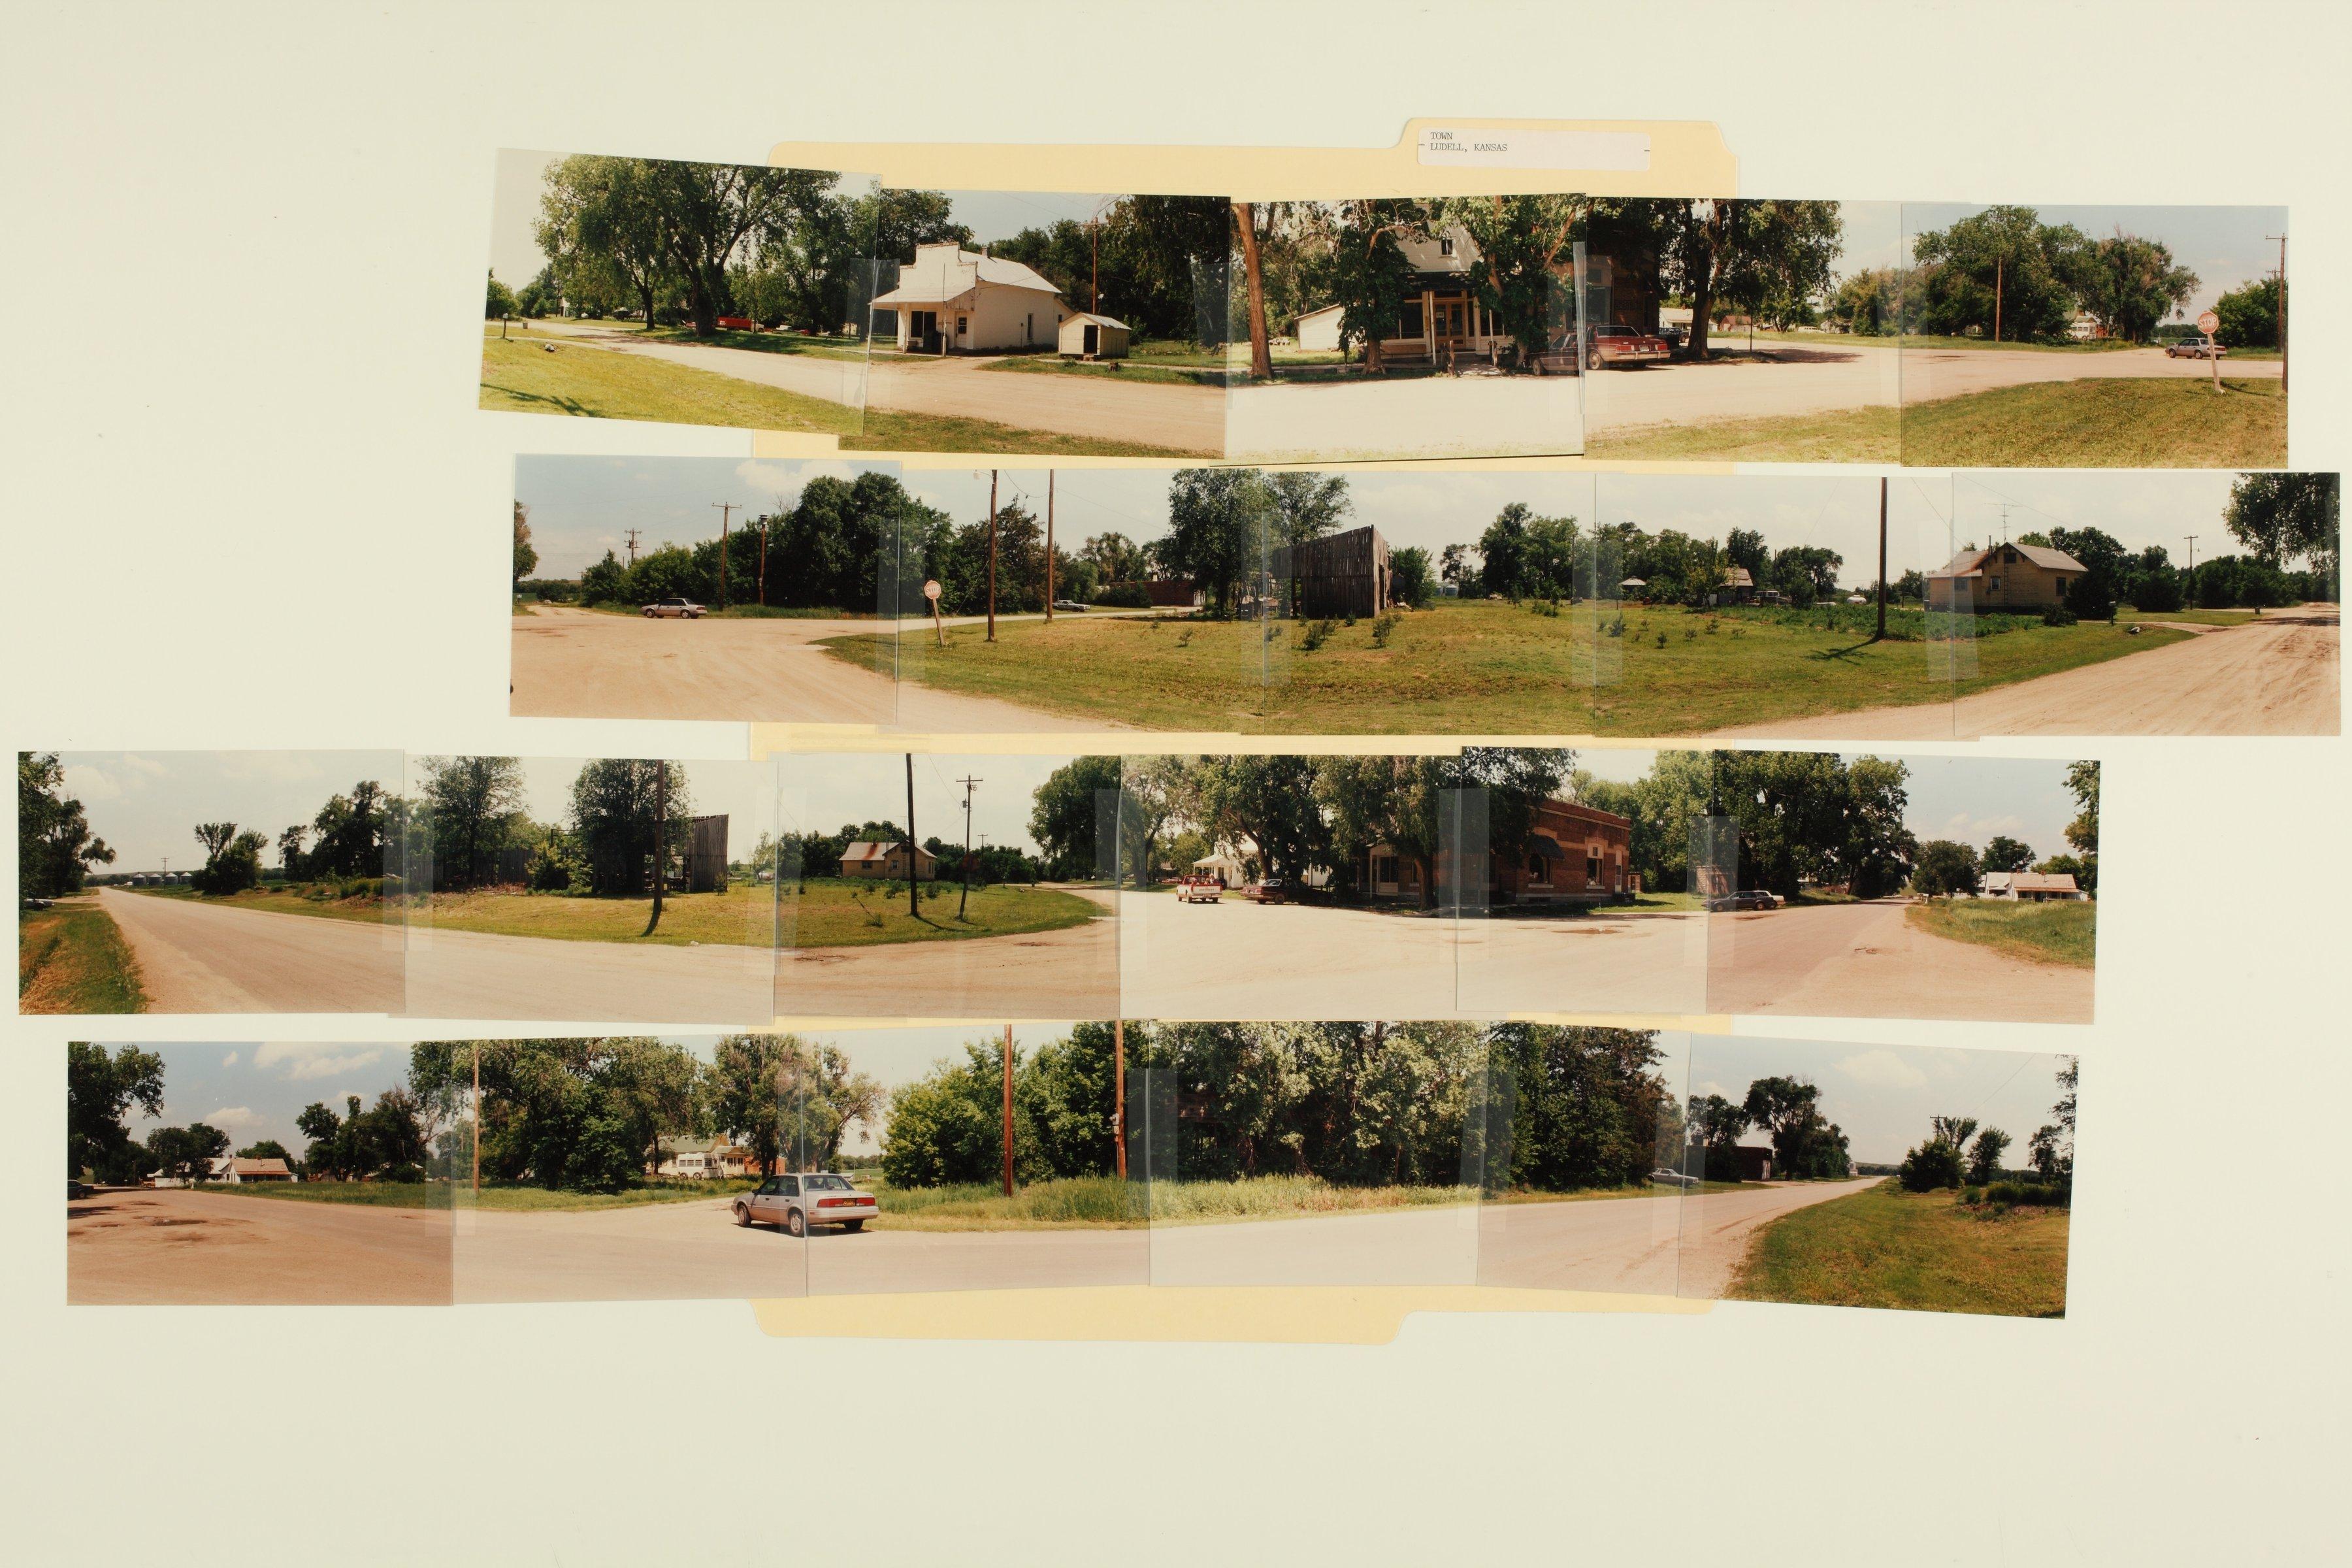 Kansas Film Commission site photographs, towns Leavenworth-Norway - 7